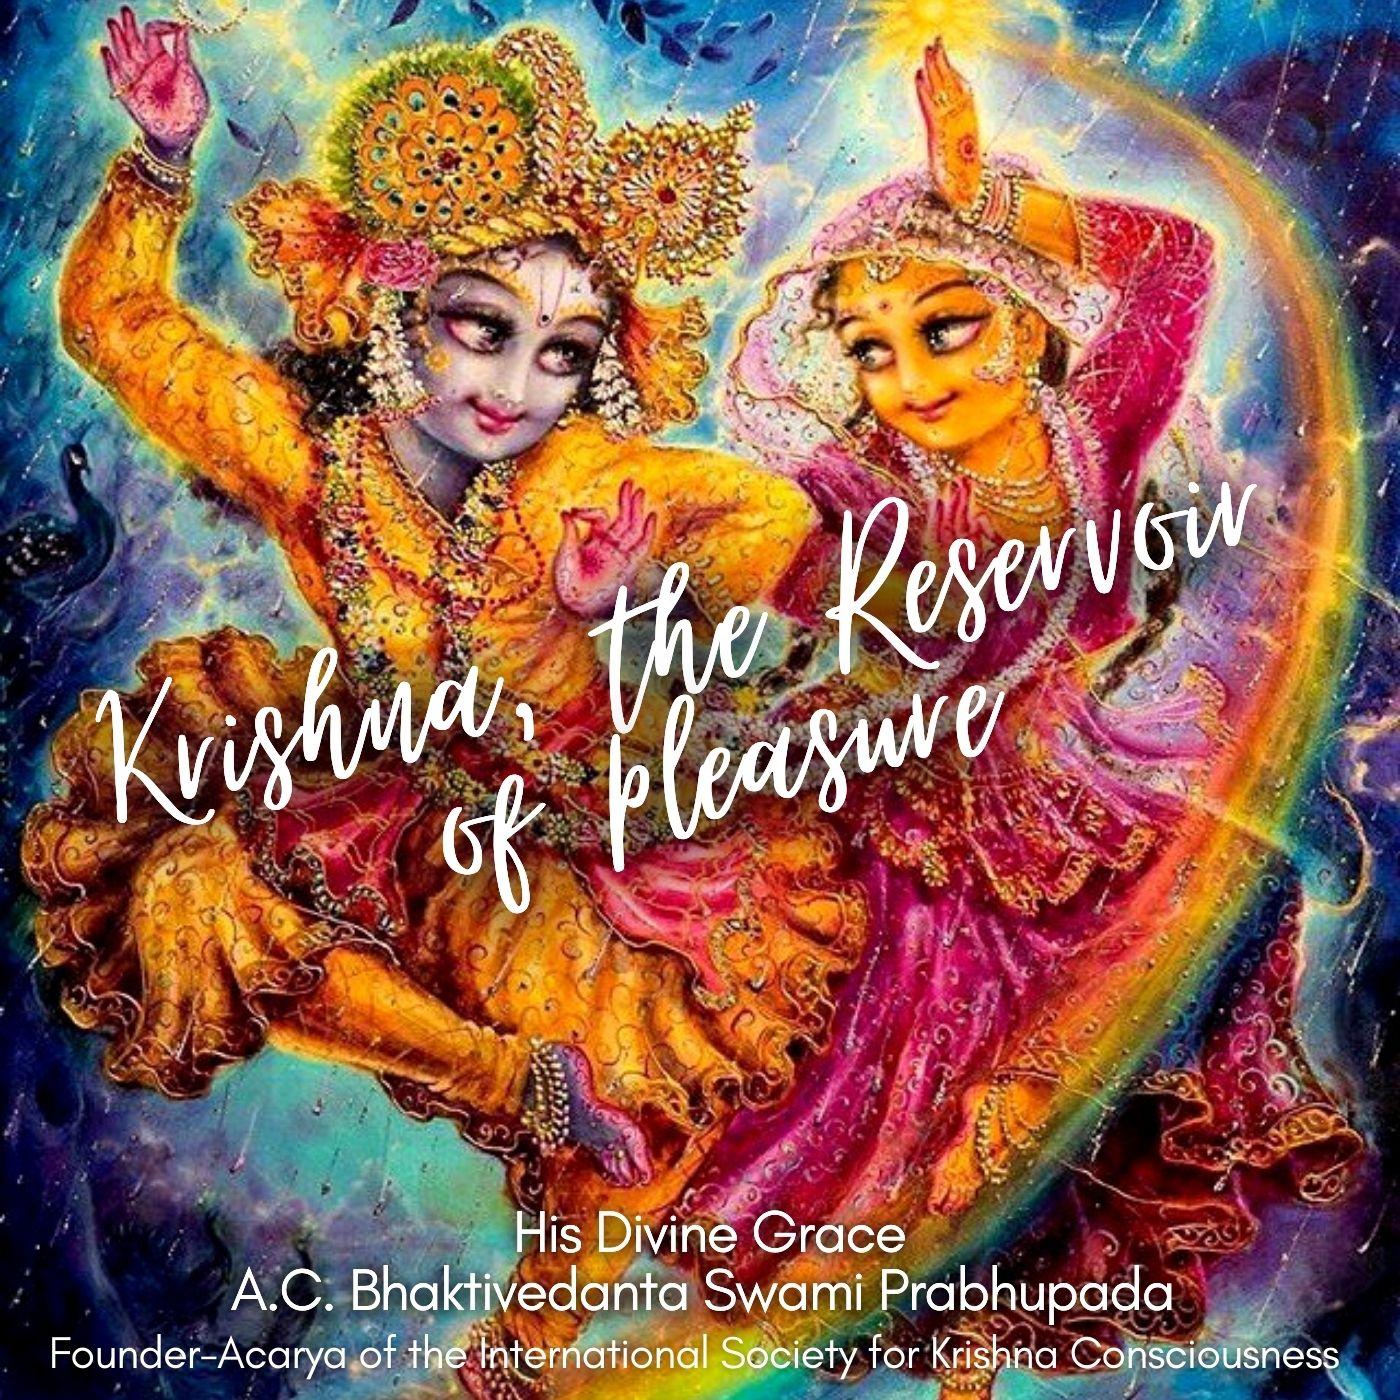 Krishna, the Reservoir of Pleasure + Who is Crazy?